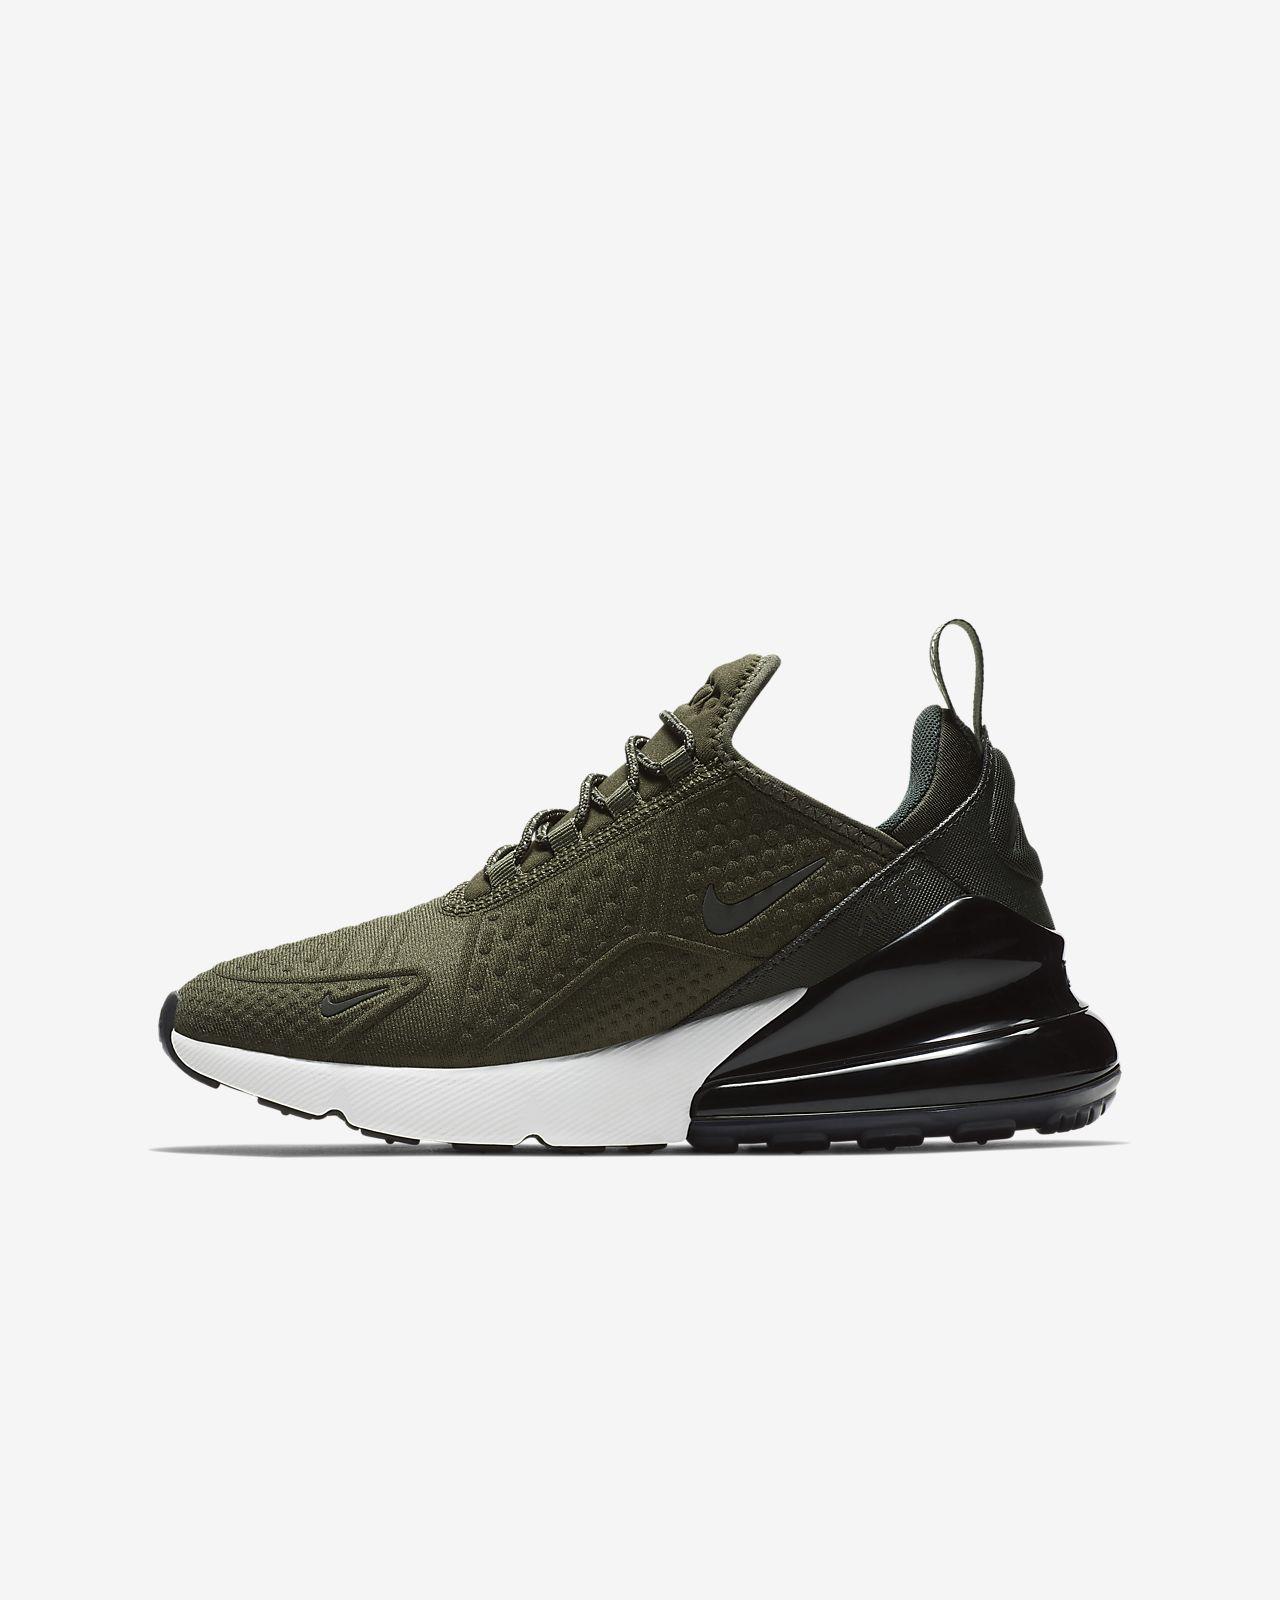 Nike Air Max 270 SE Big Kids' Shoe